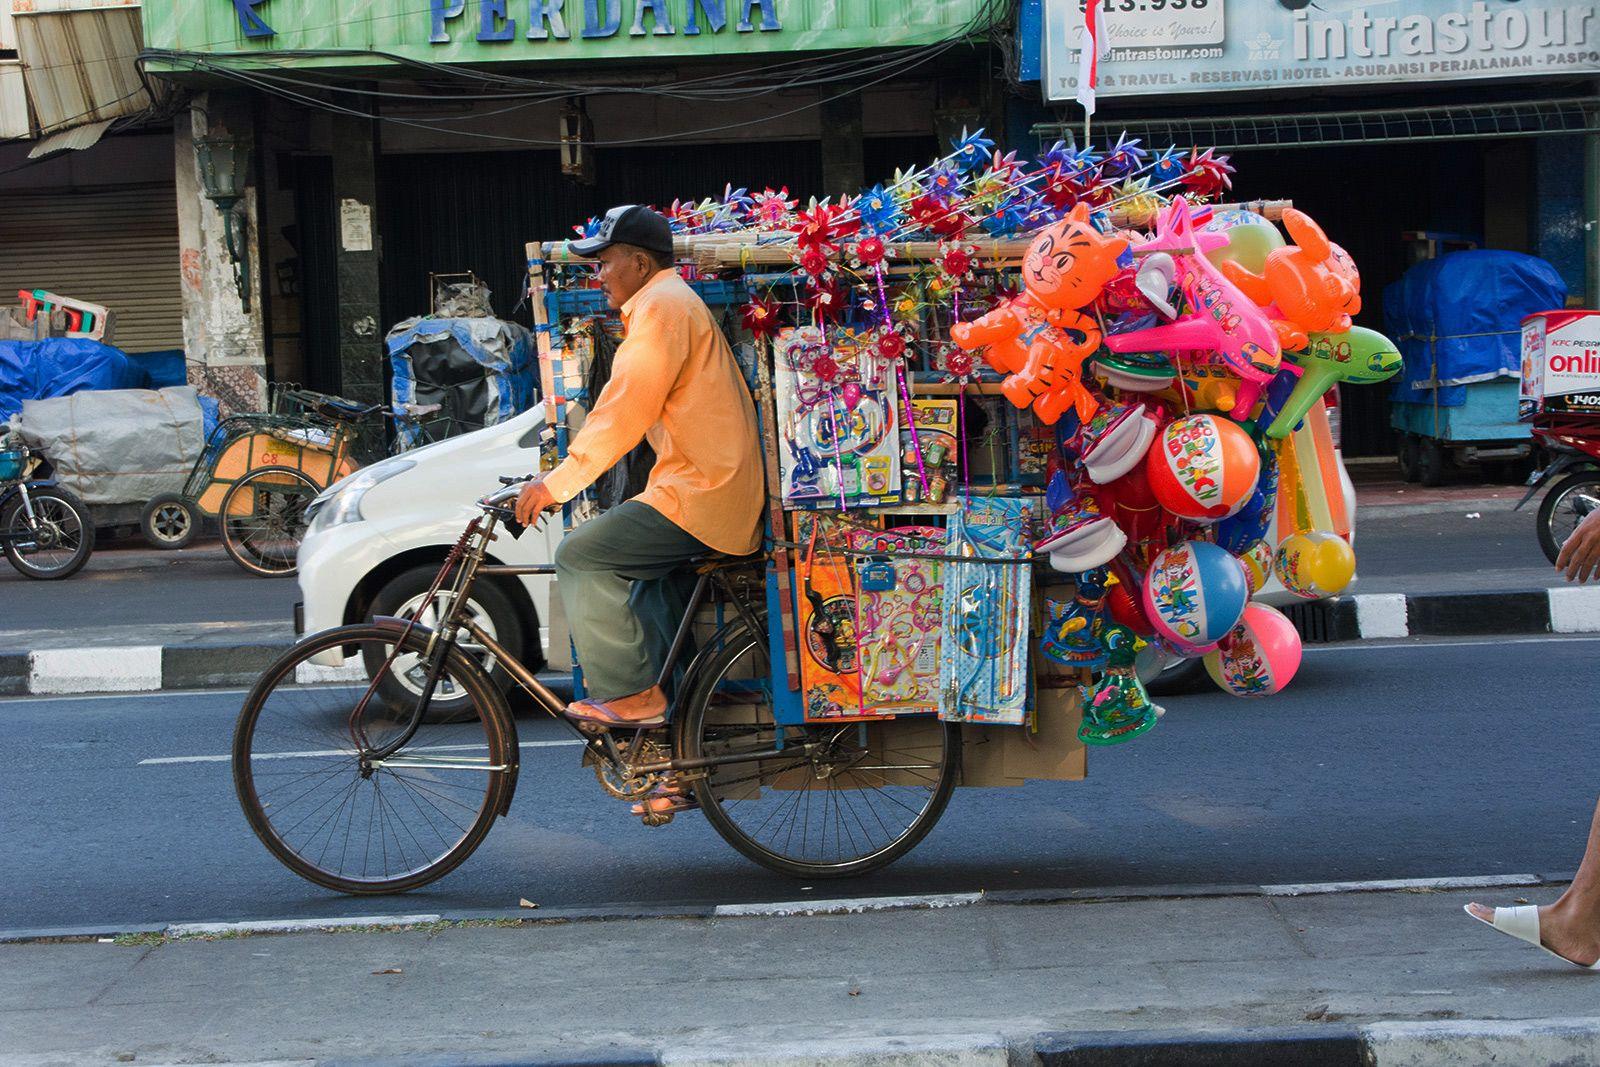 Vendeur ambulant à Yogyakarta